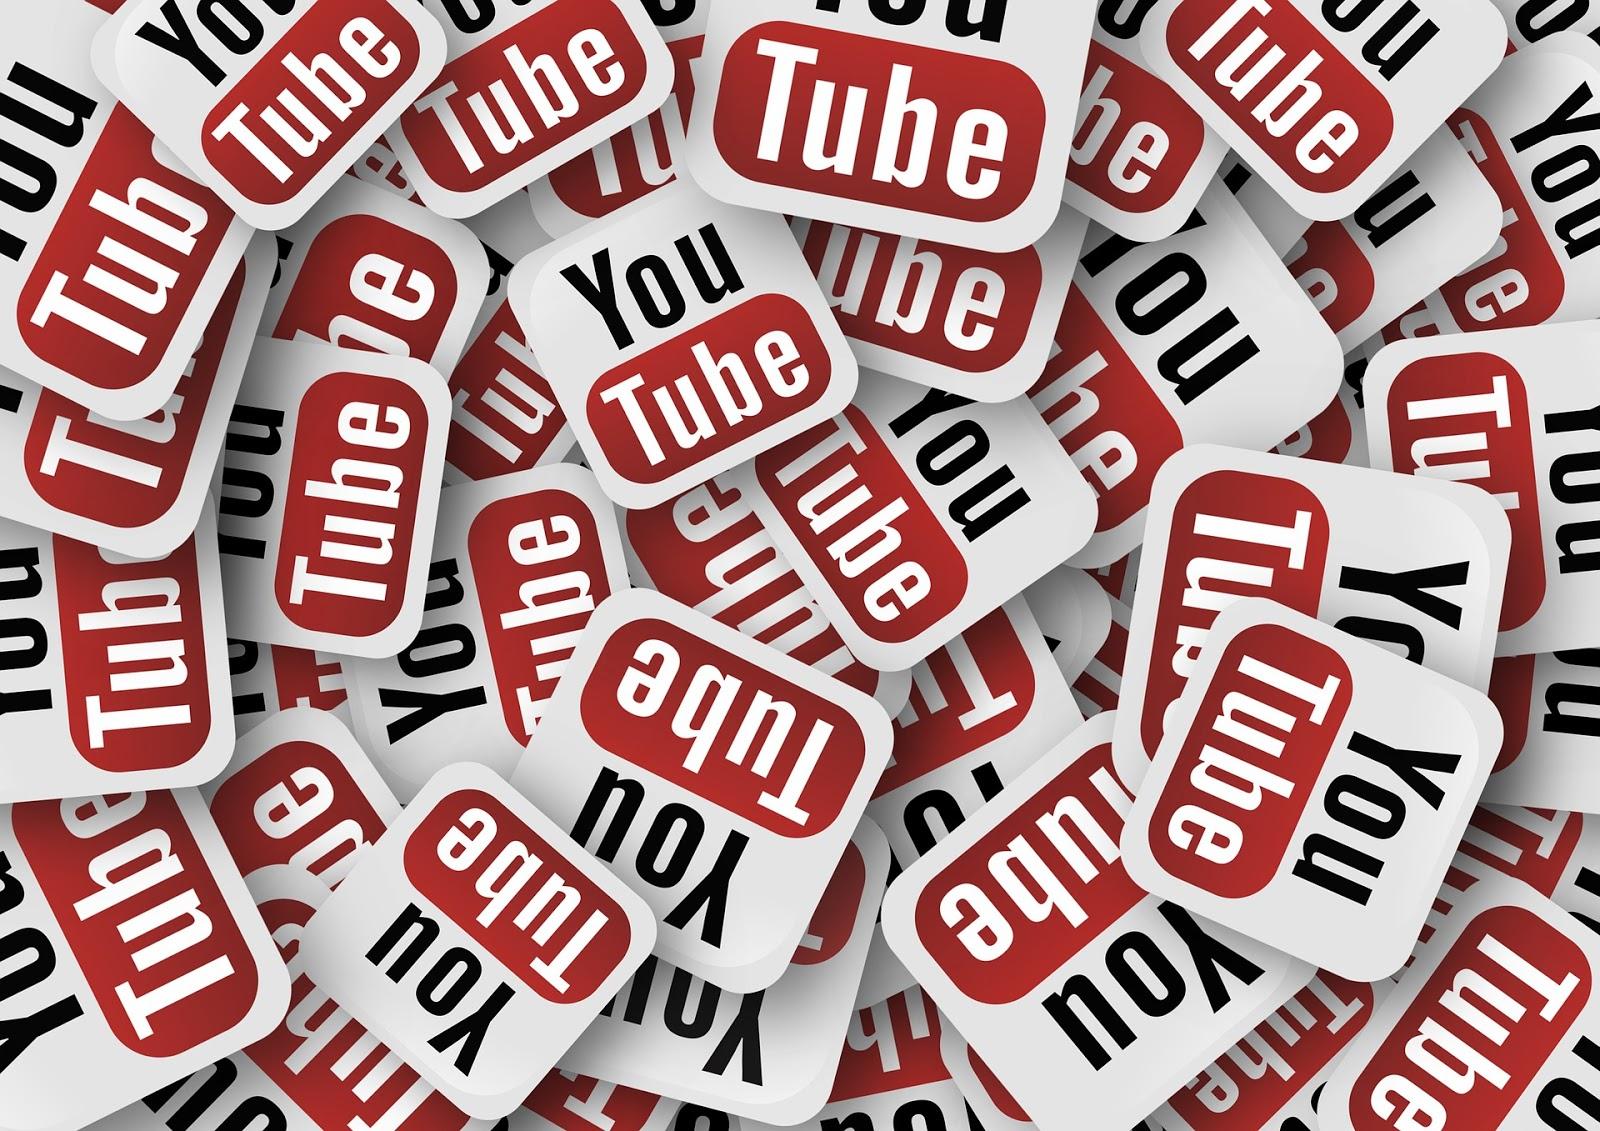 Qualitatives Youtube Entertainment